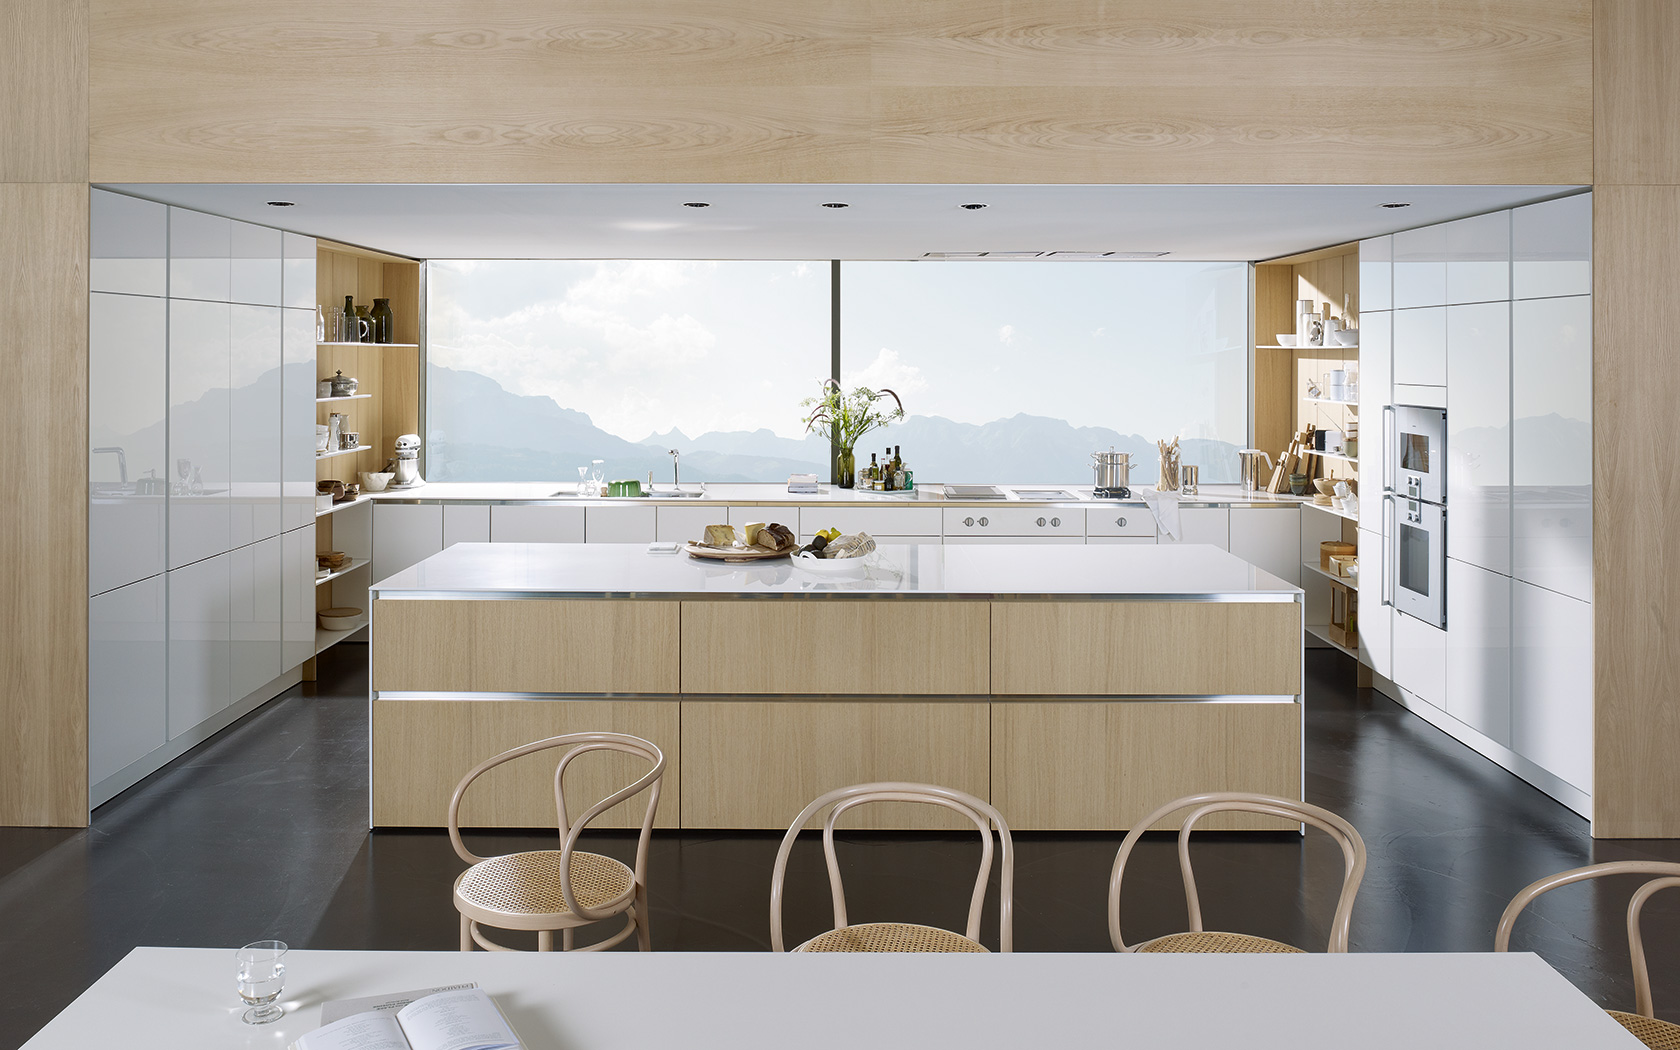 Ikea Store Kitchen Design